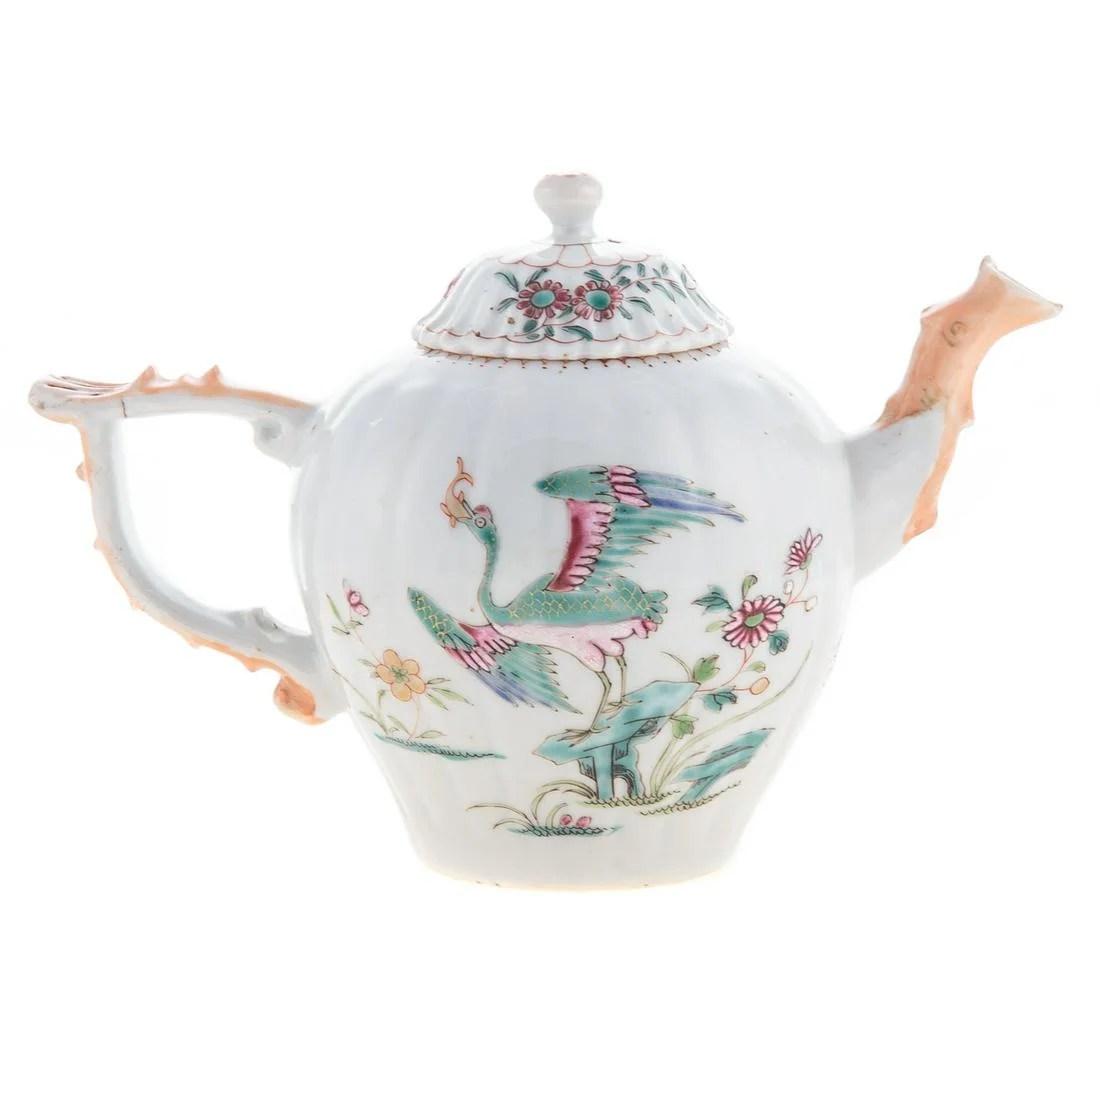 Chinese Export Famille Rose Globular Teapot